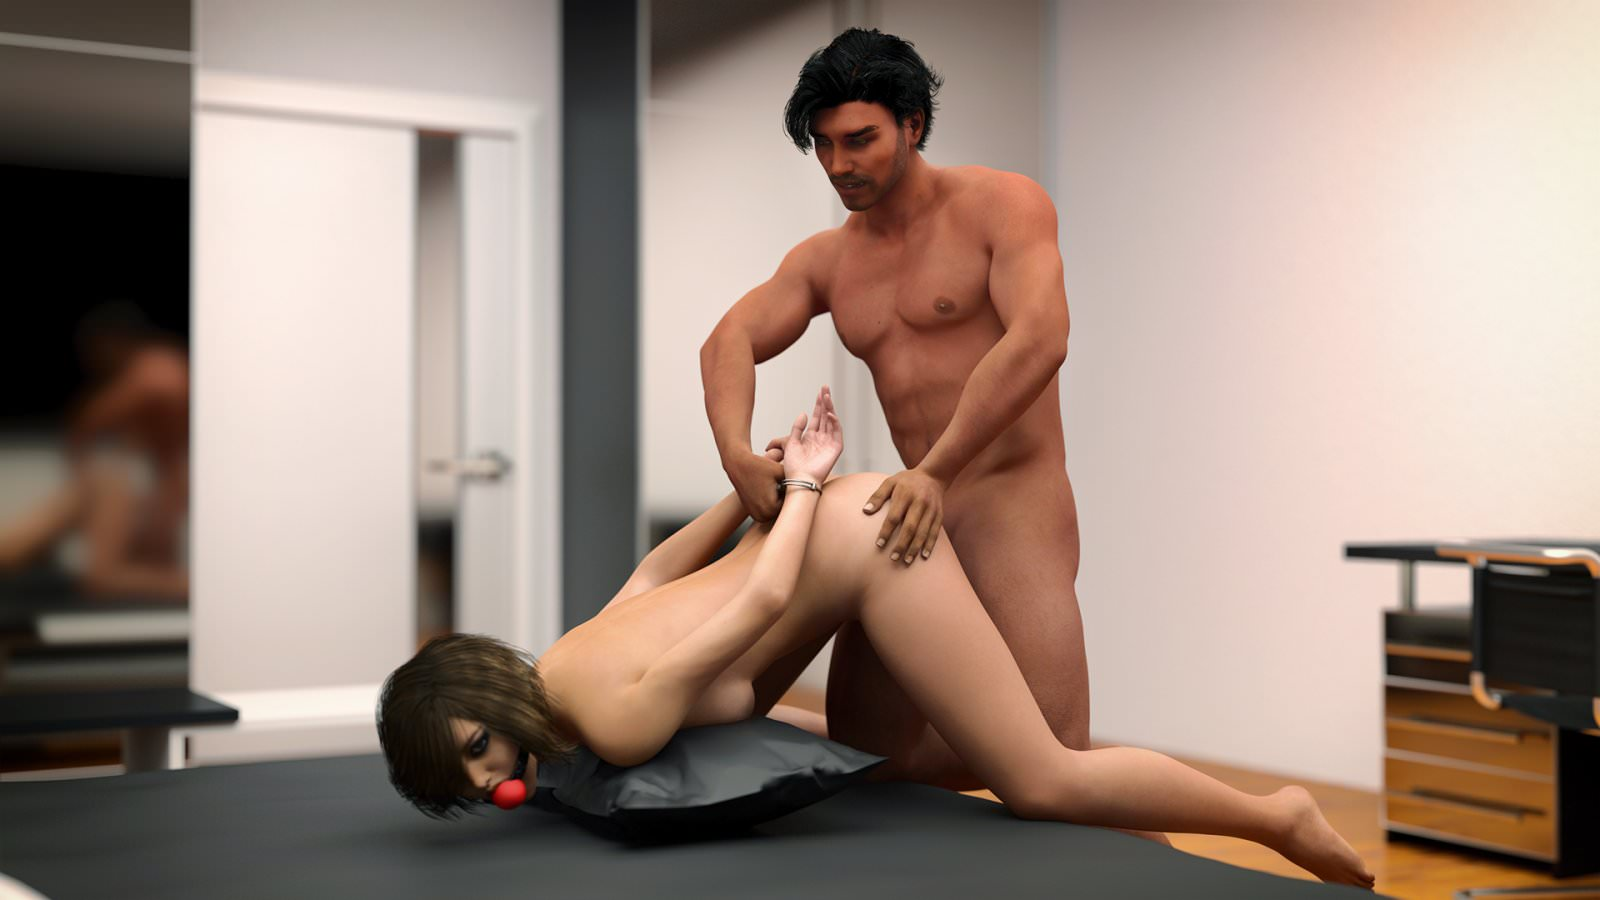 порно тубе лезбиянки